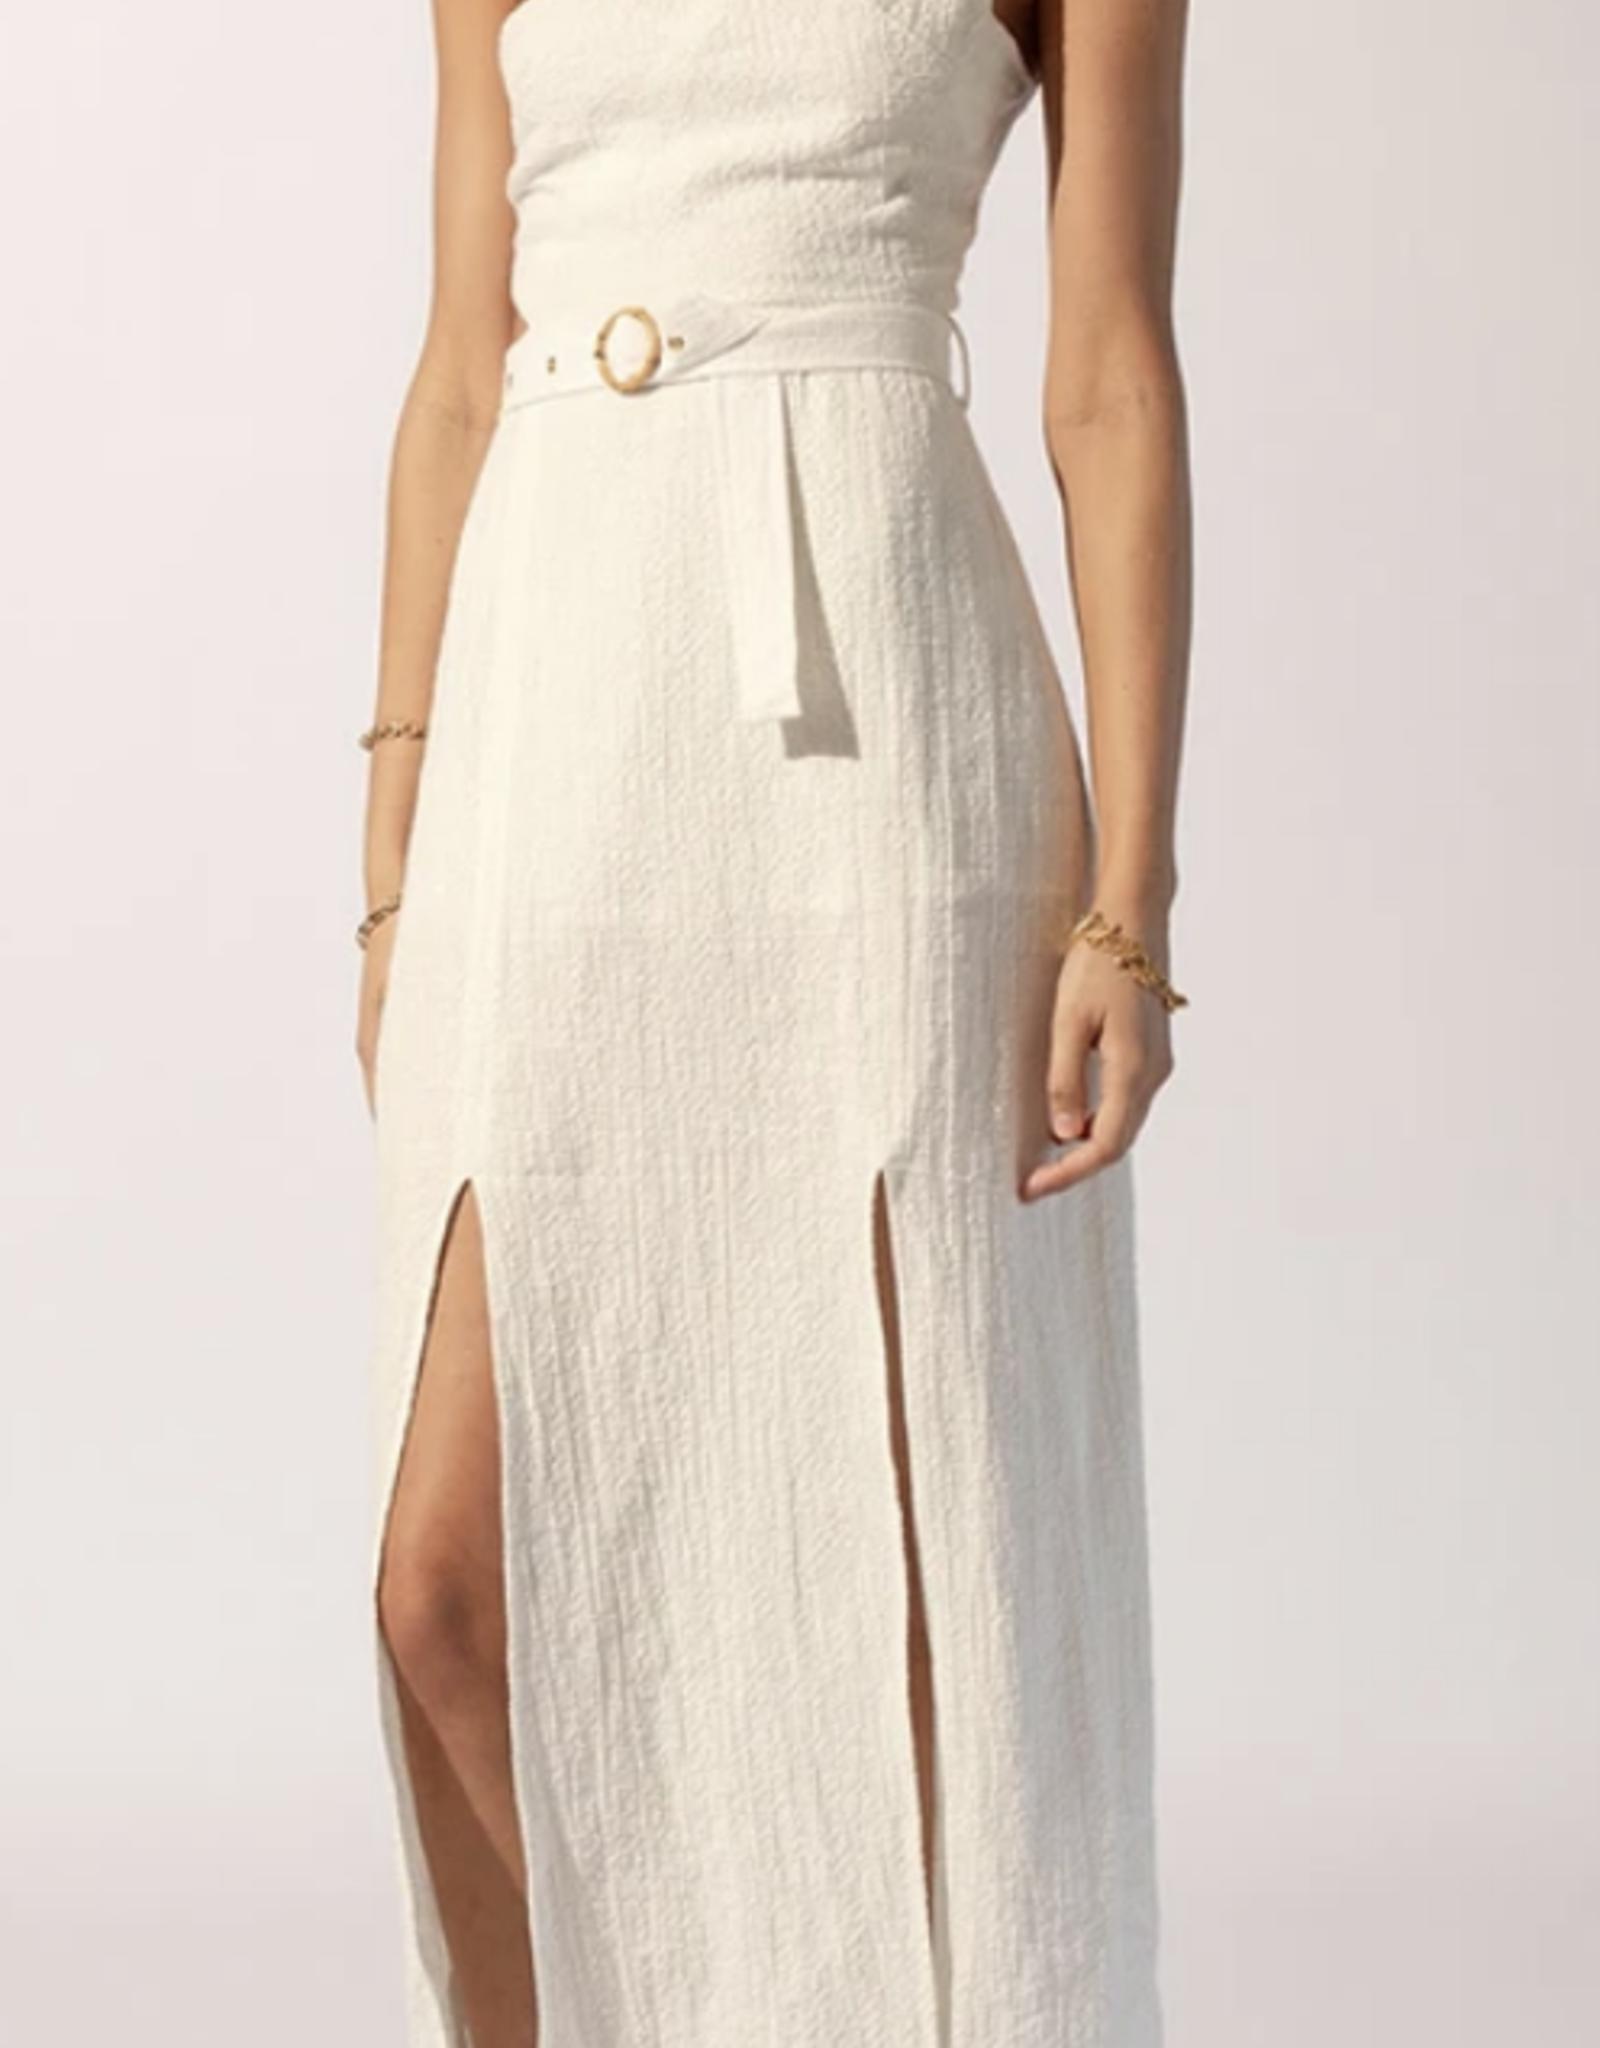 Suboo White Kaia Bamboo Ring Asymmetrical Dress